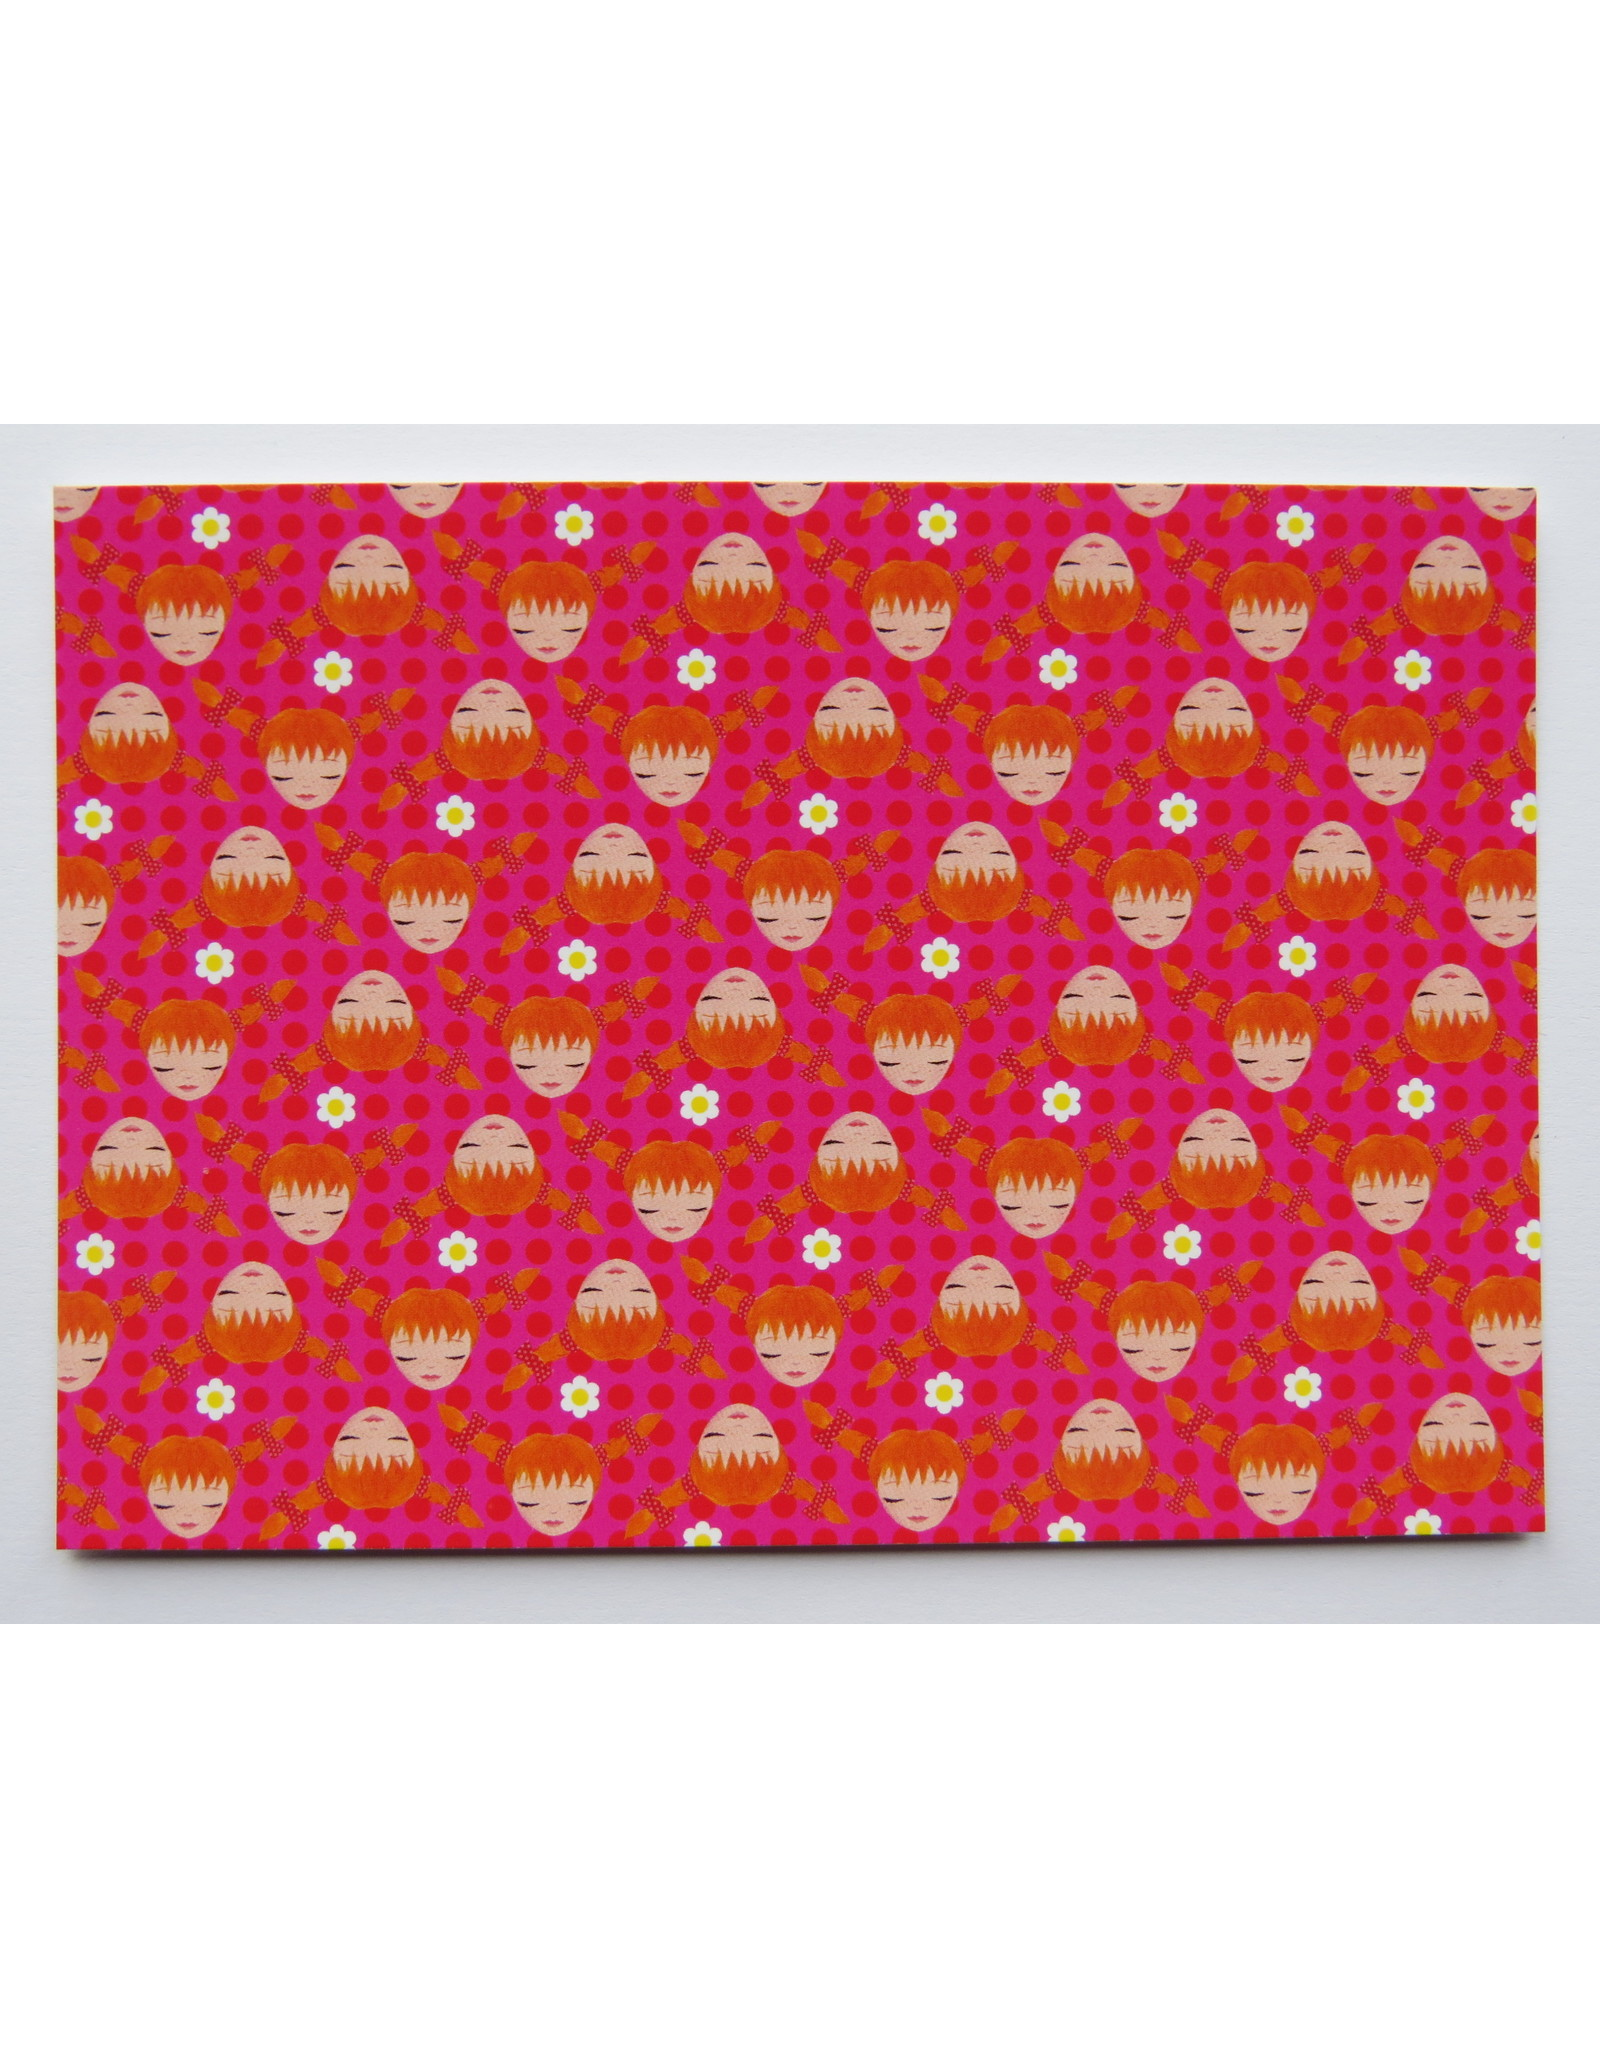 Pippi Langkous Pippi Longstocking card - pink!